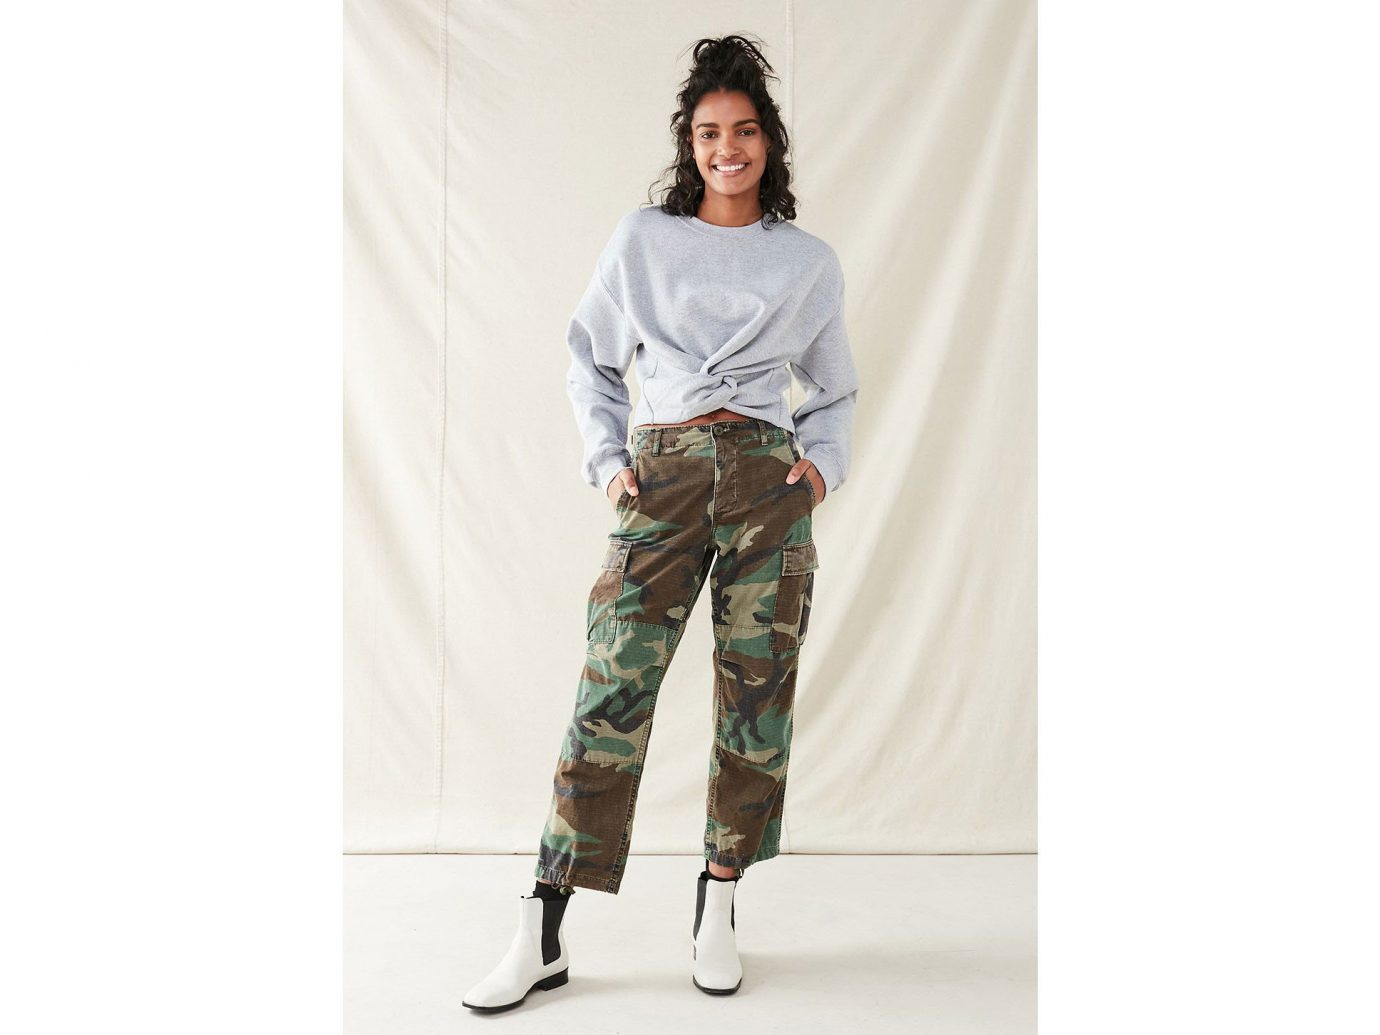 Travel Shop Travel Trends man person jeans fashion model trousers waist joint denim abdomen shoe pattern posing male trouser